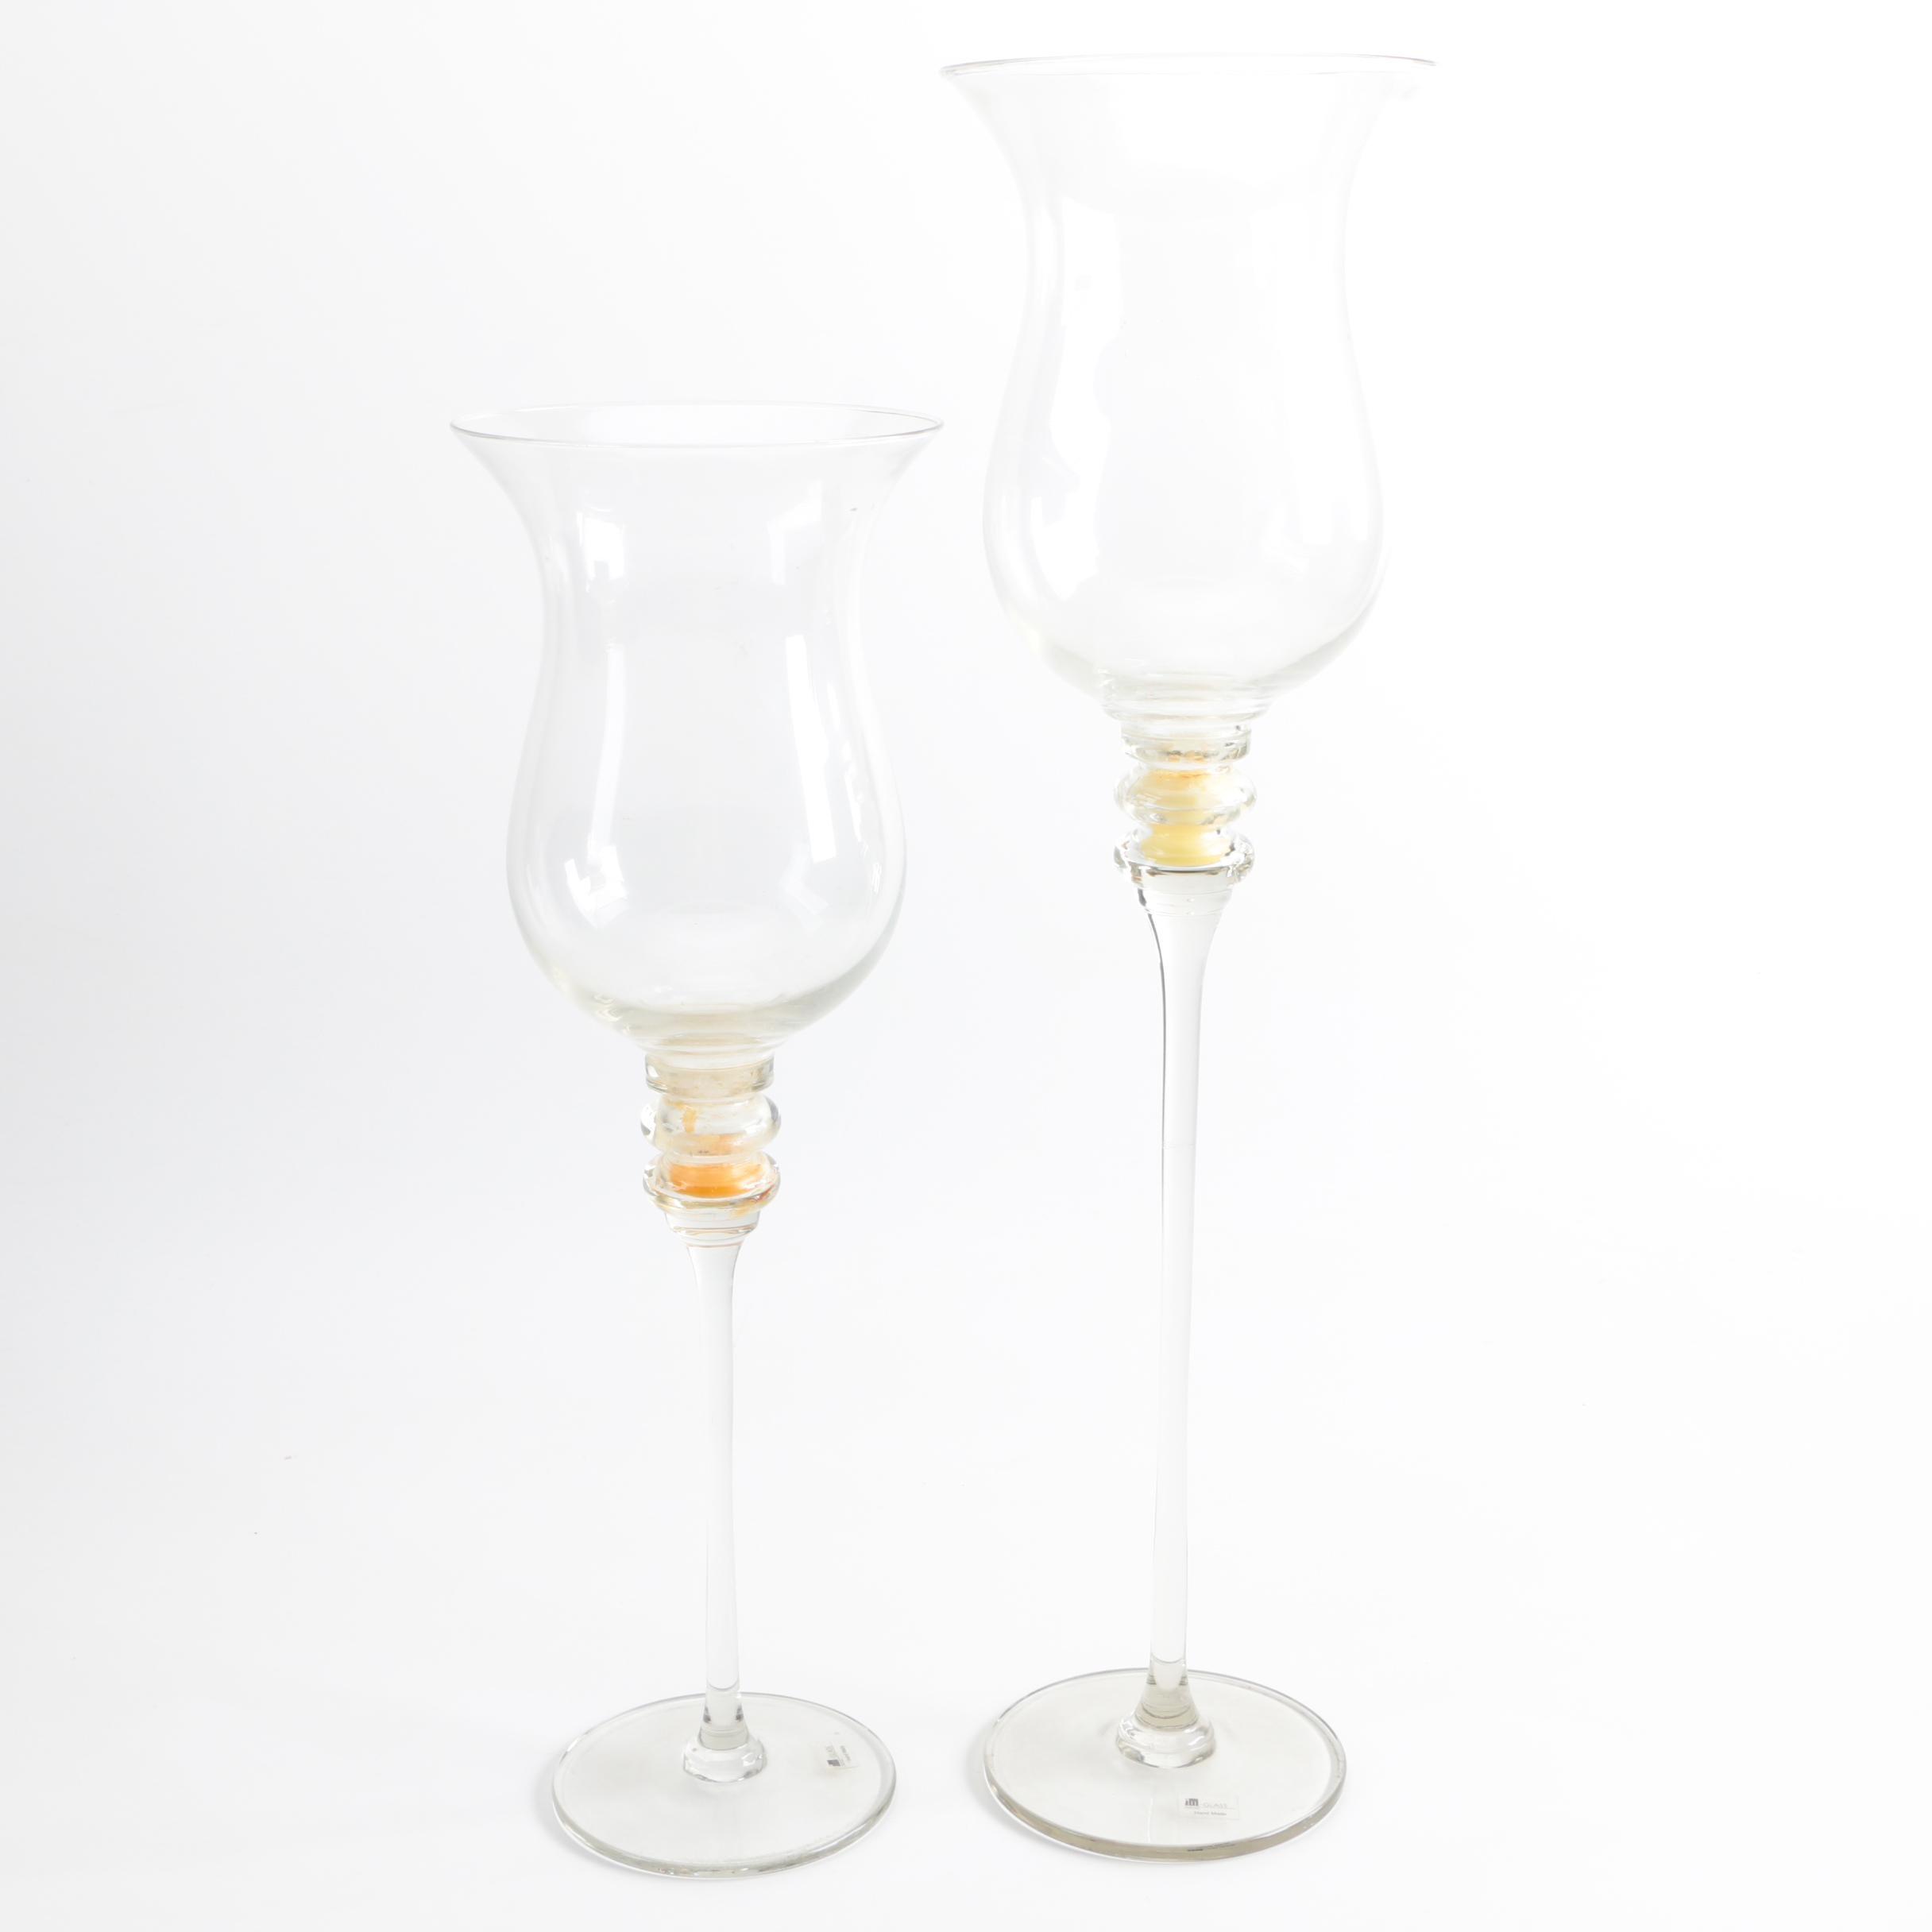 JM Glass Goblet Shaped Candle Holders